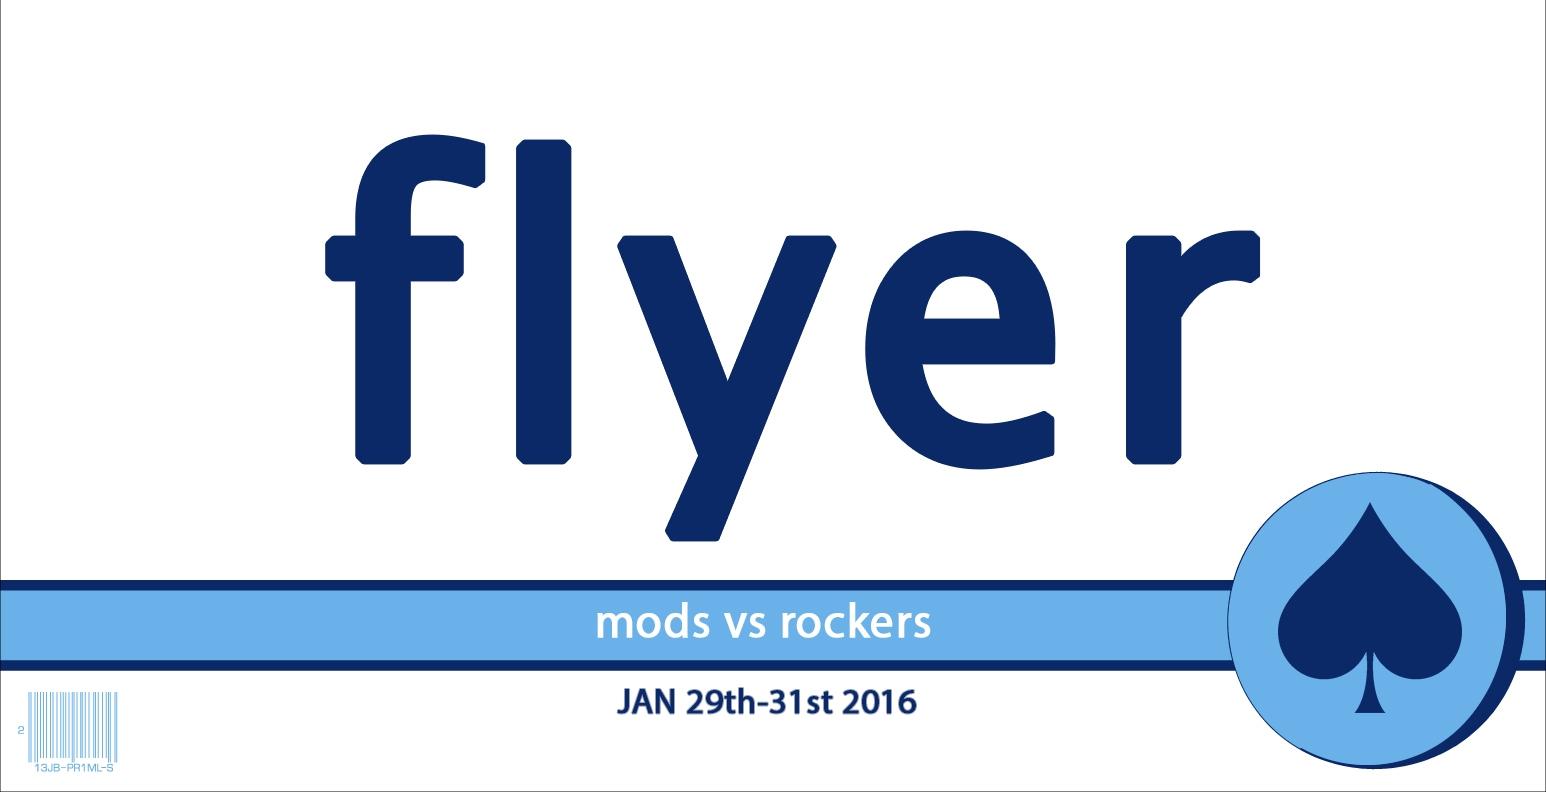 https://www.facebook.com/San-Diego-Mods-vs-Rockers-826078170769390/